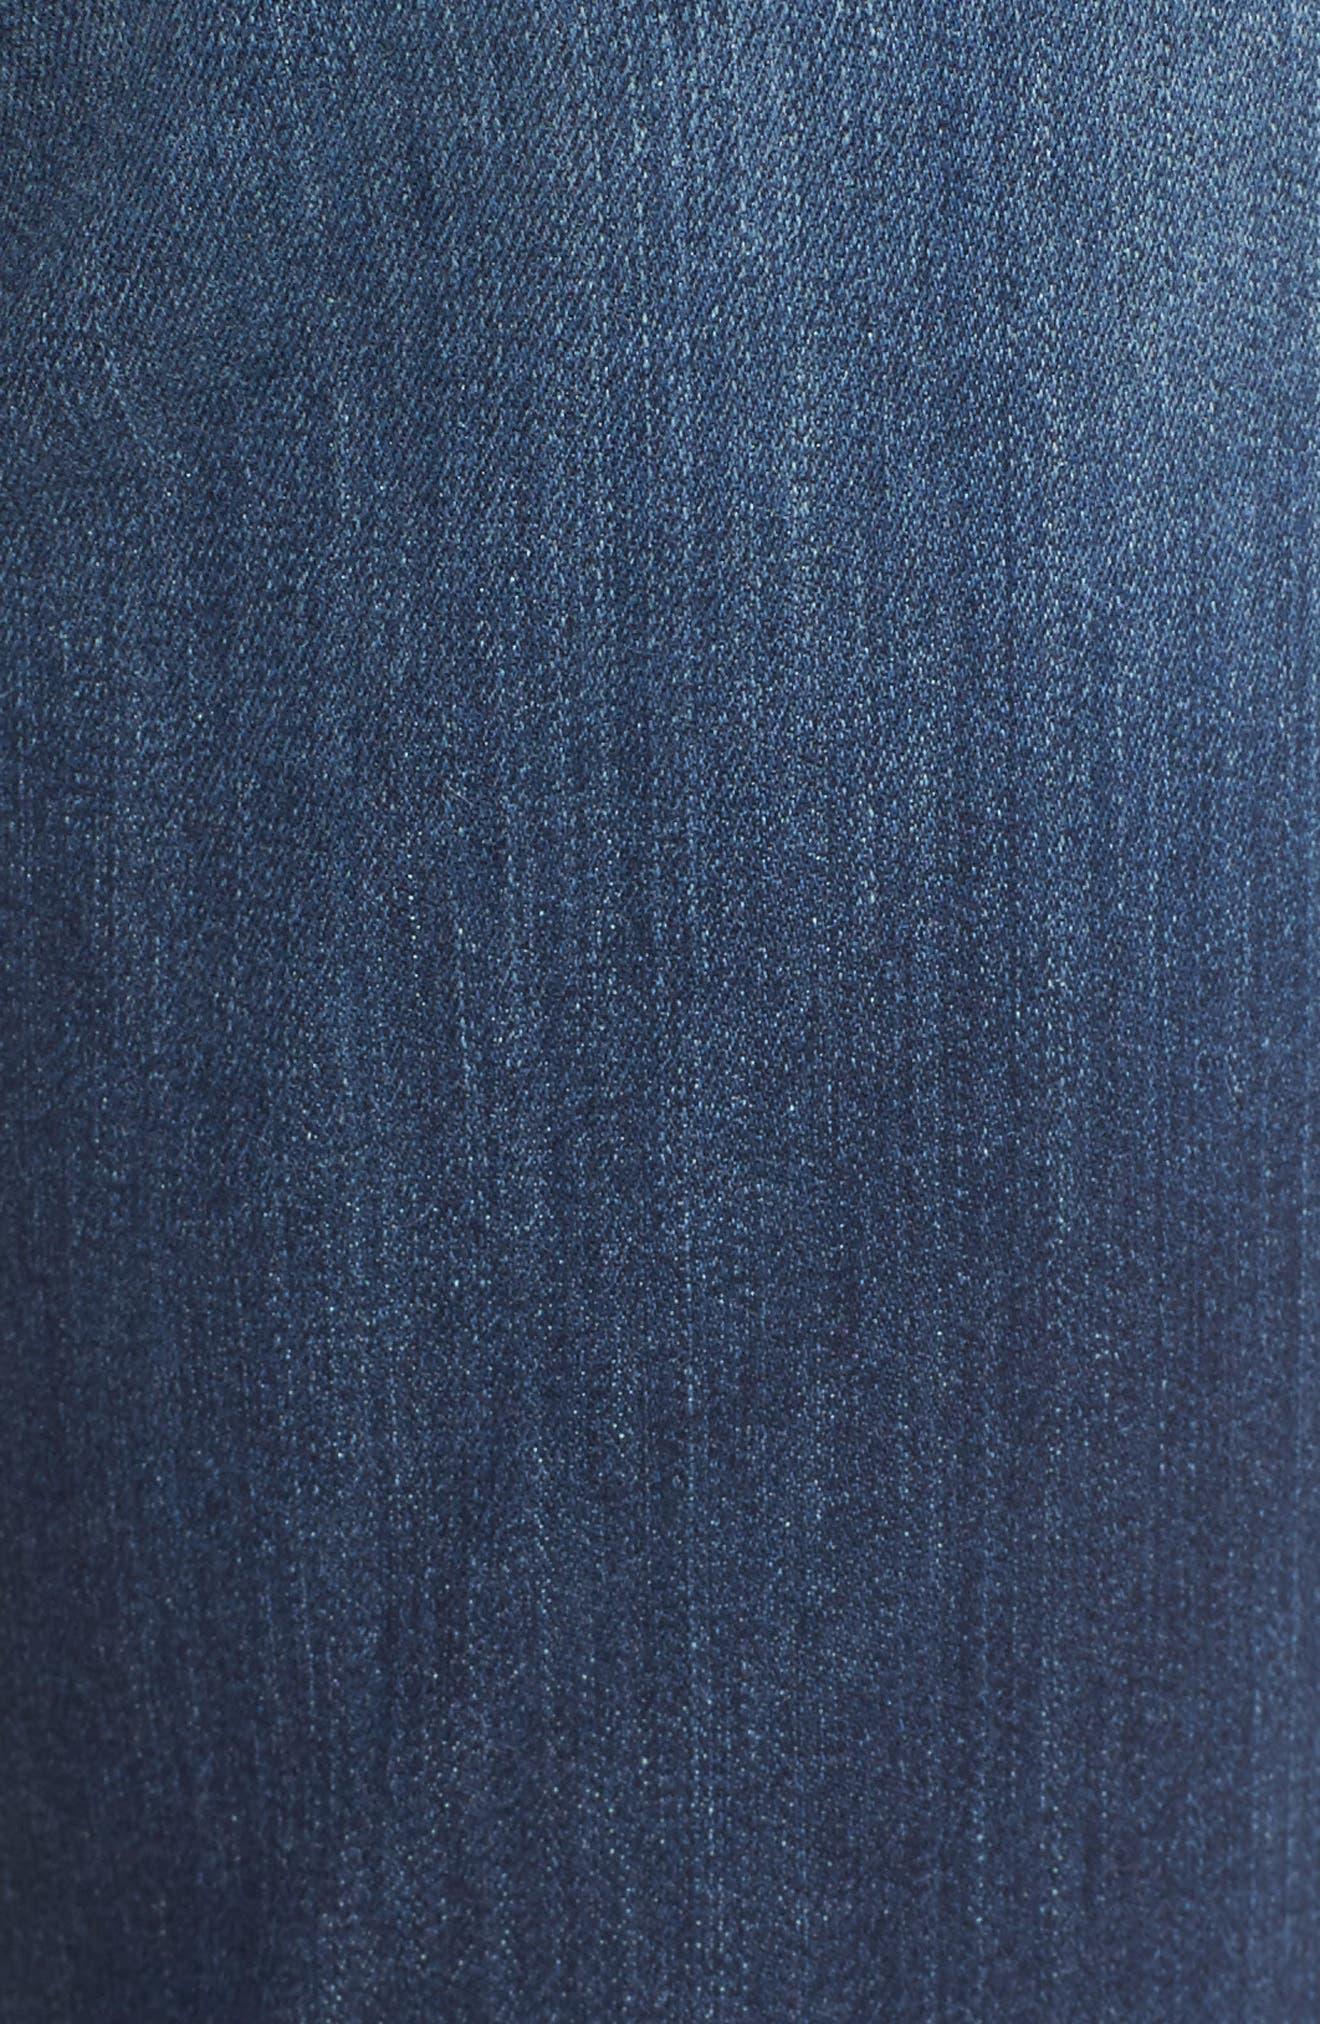 Ami Release Hem Stretch Skinny Jeans,                             Alternate thumbnail 5, color,                             464